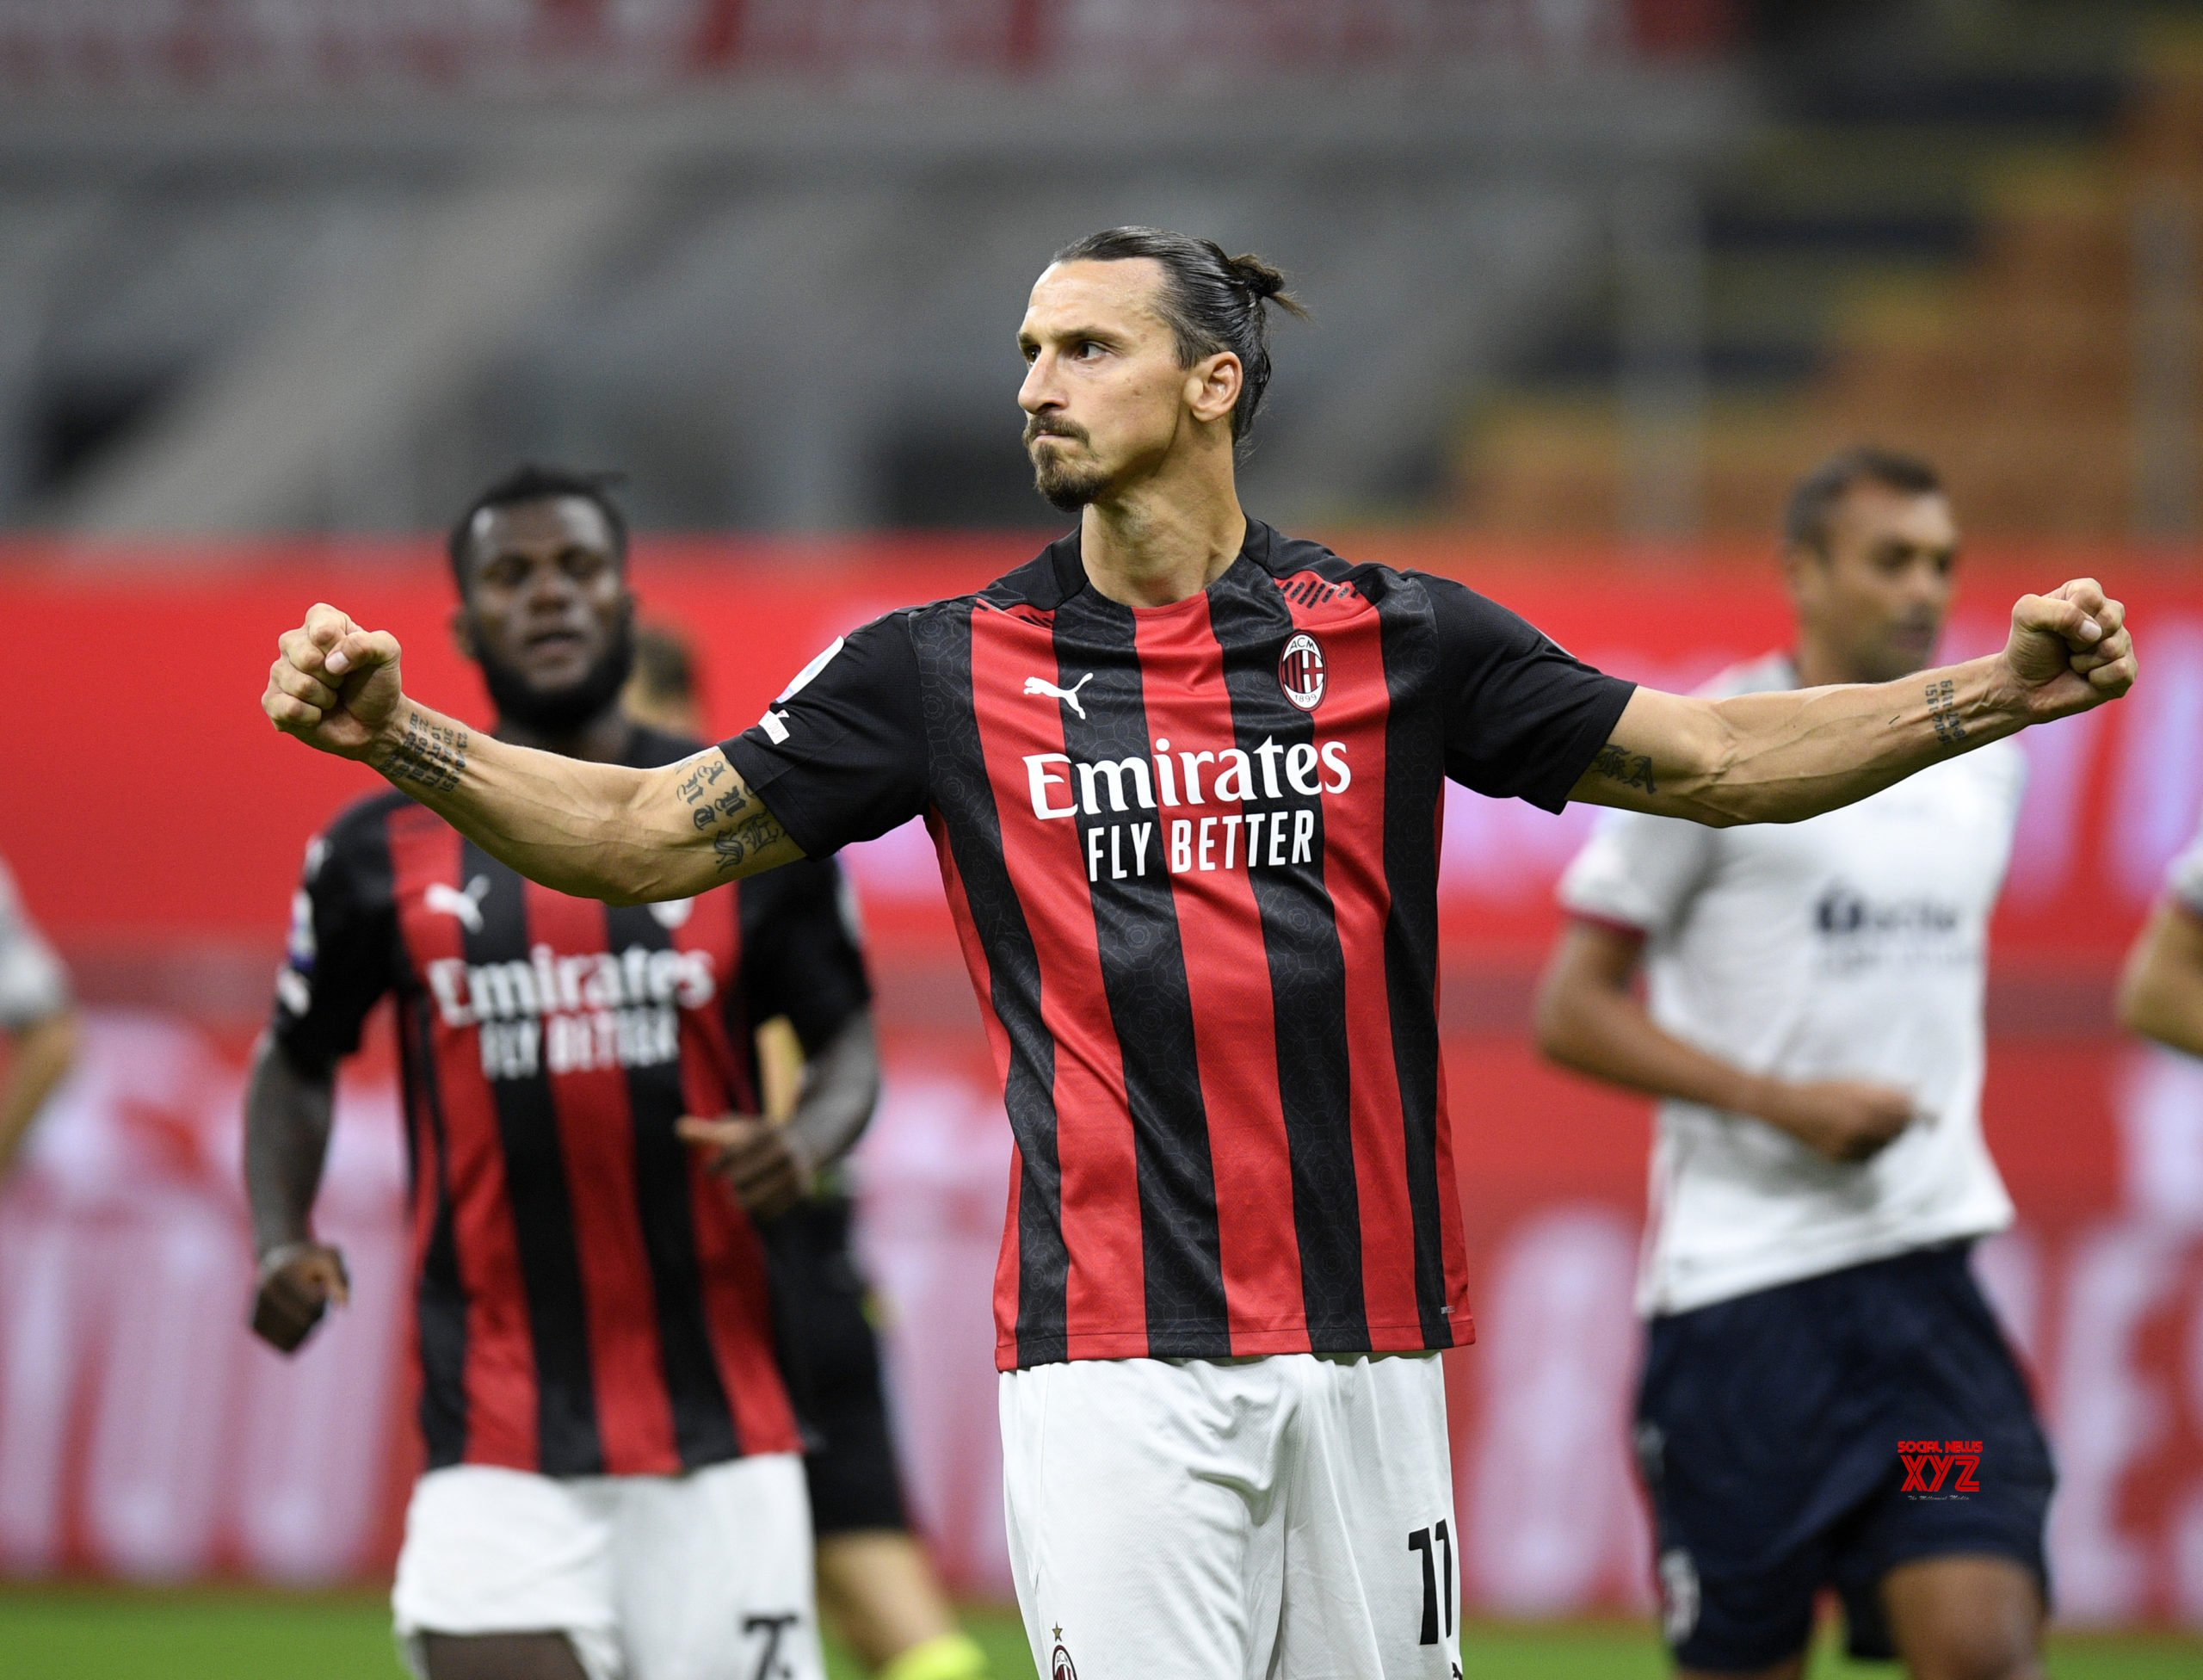 Zlatan Ibrahimovic scores twice as AC Milan win first match